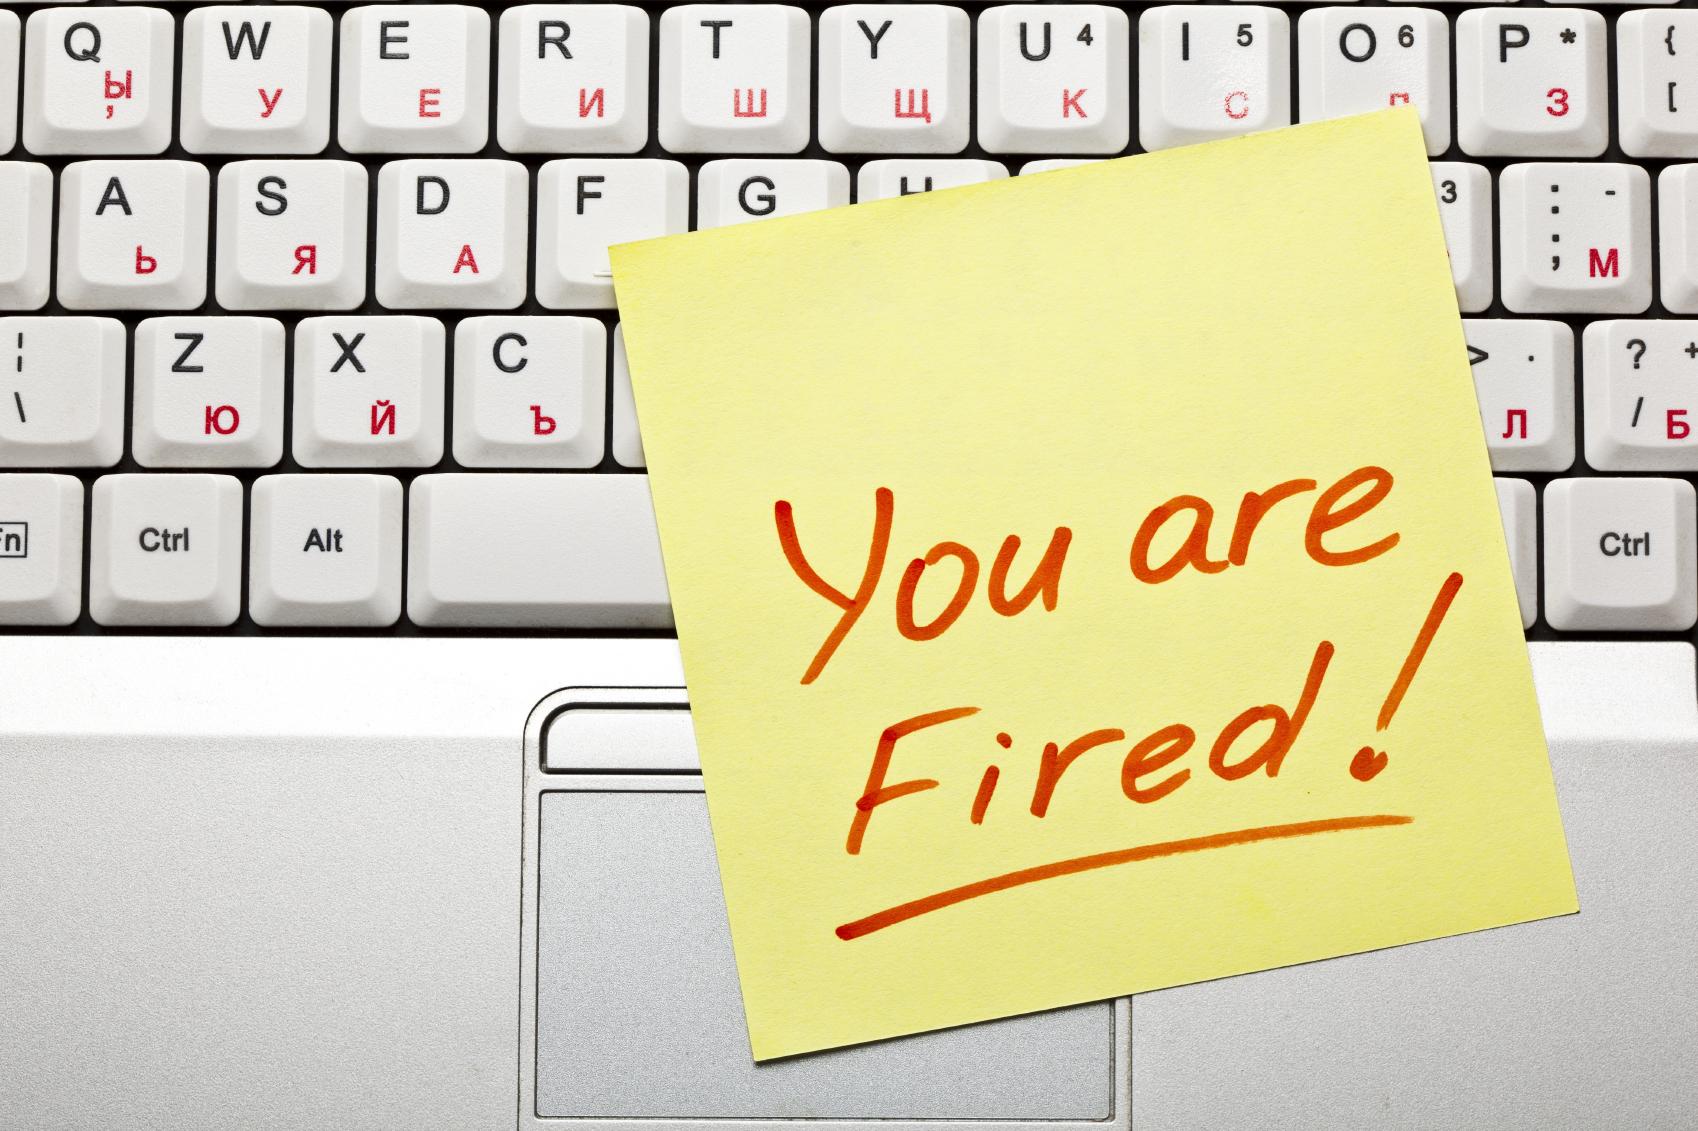 daniella English Blogger Canadian fired